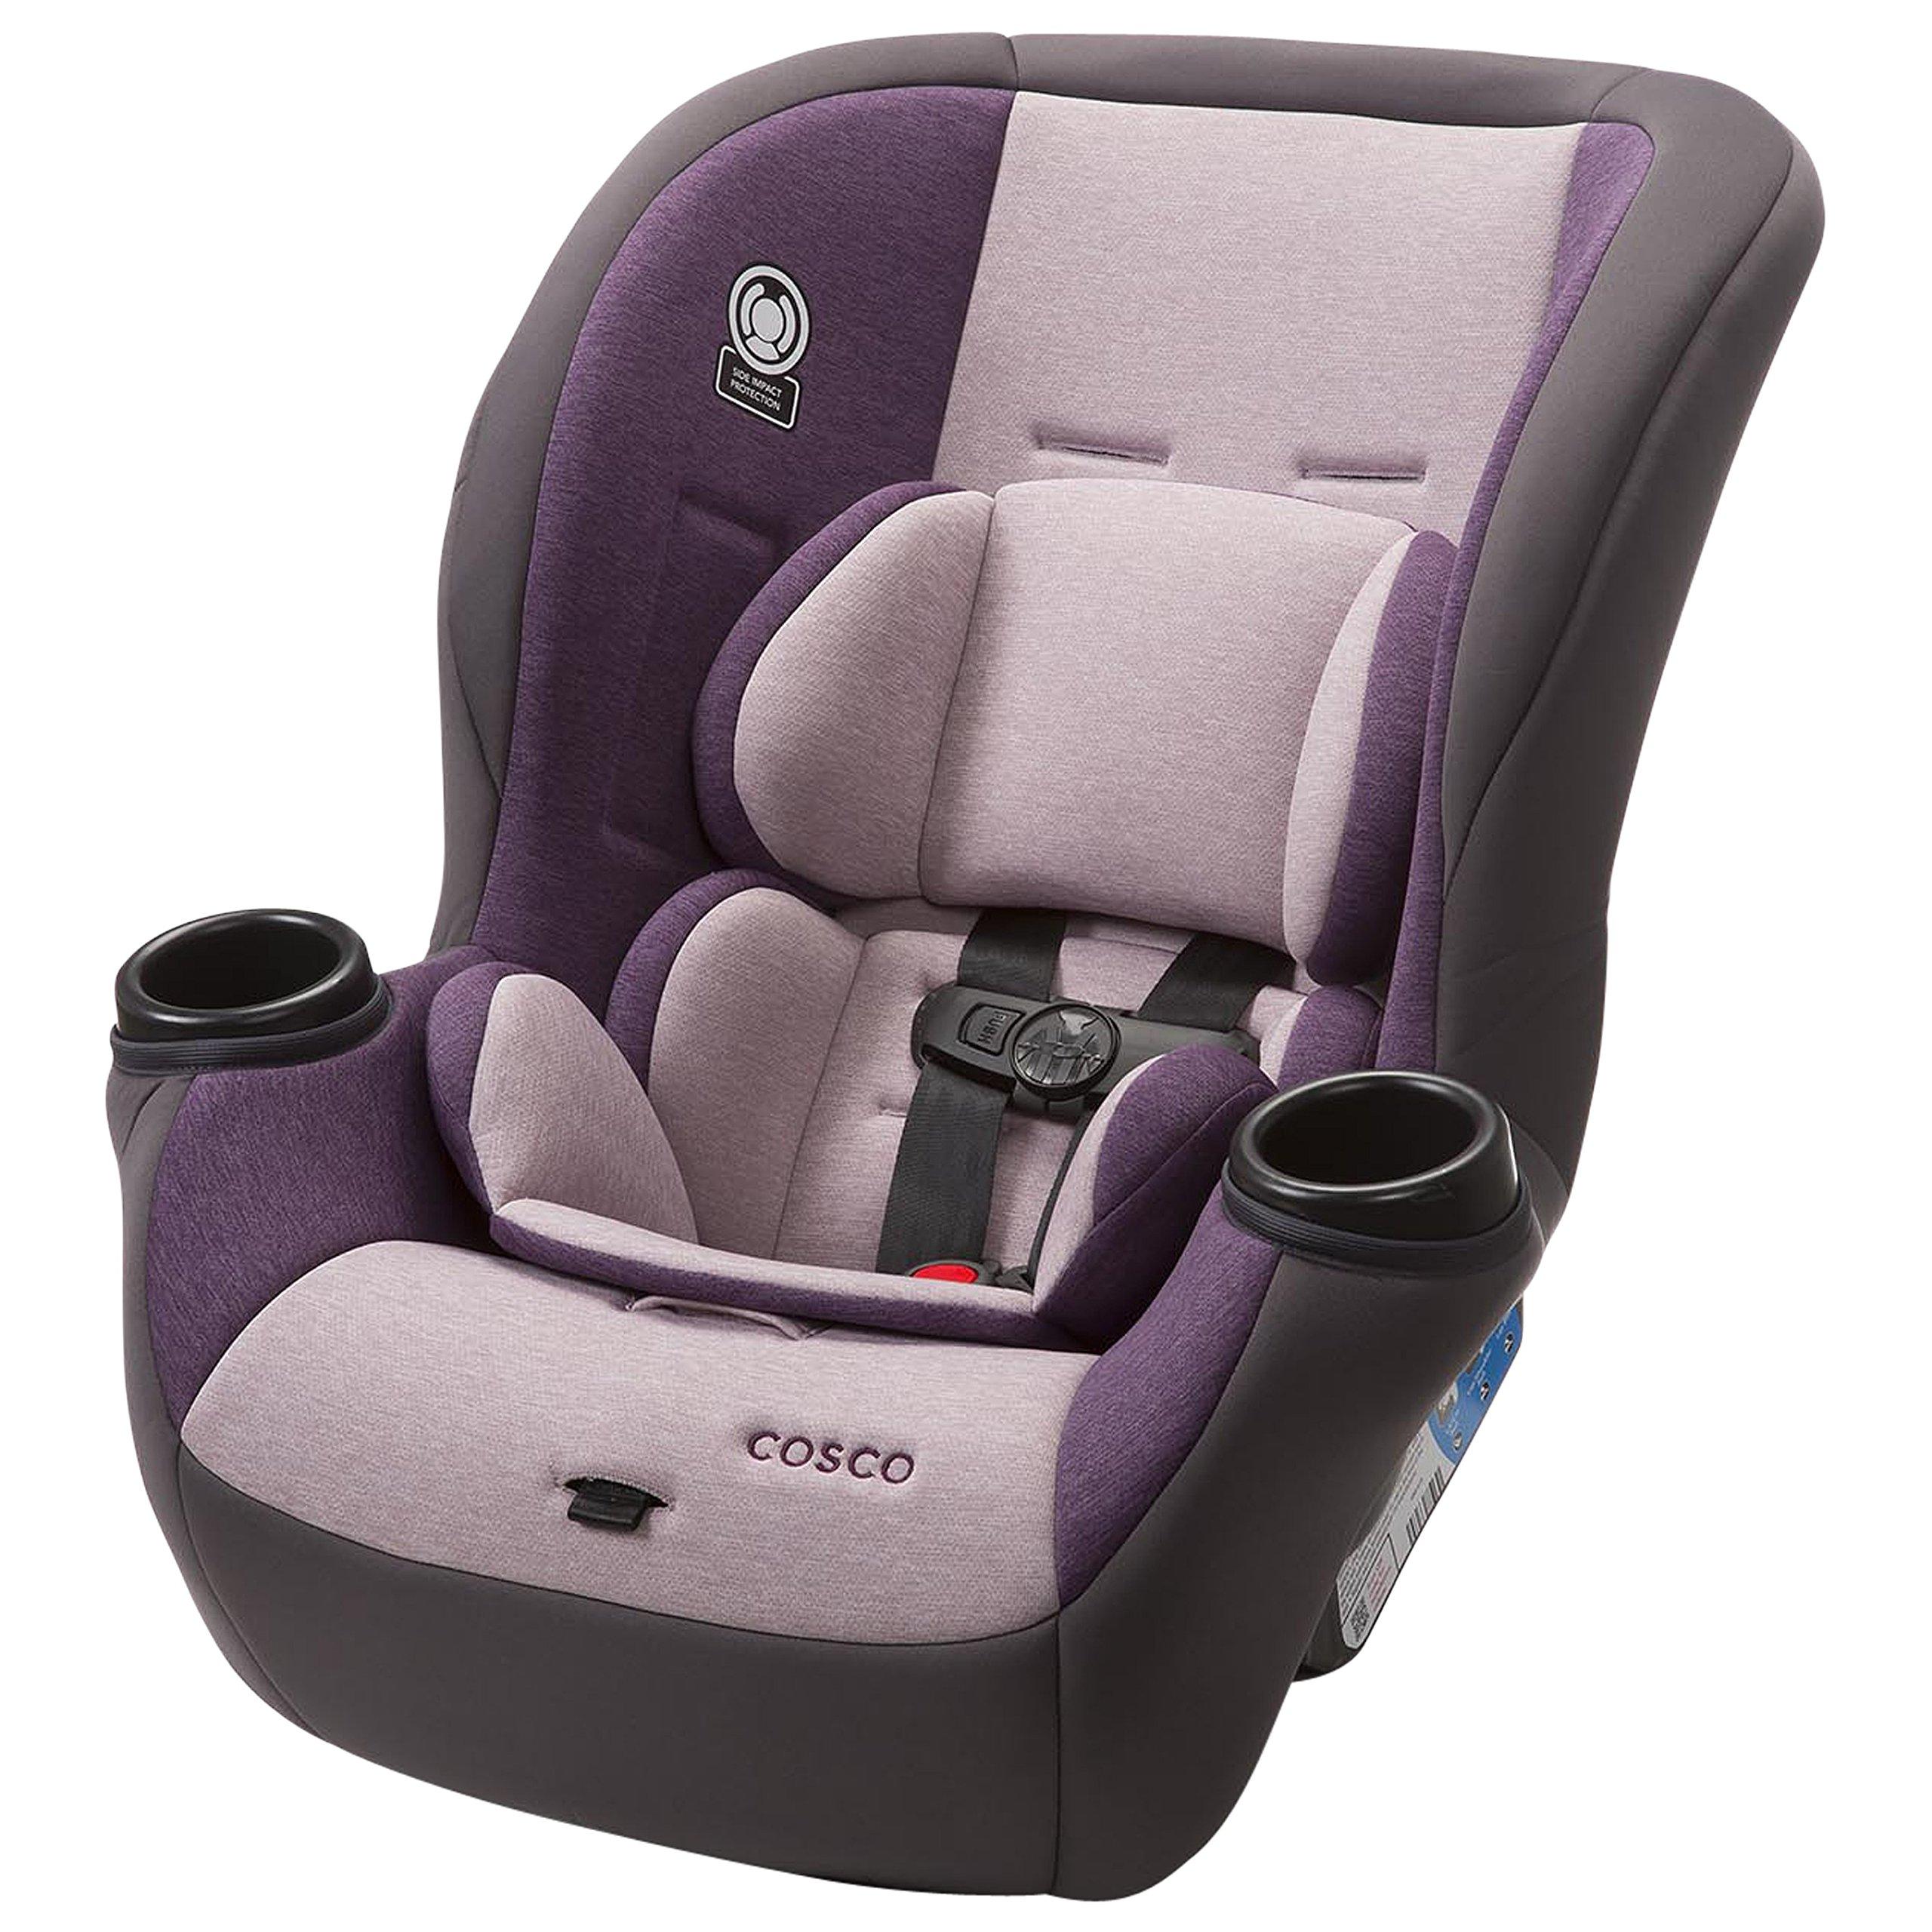 Cosco Comfy Convertible Car Seat, Heather Amethyst